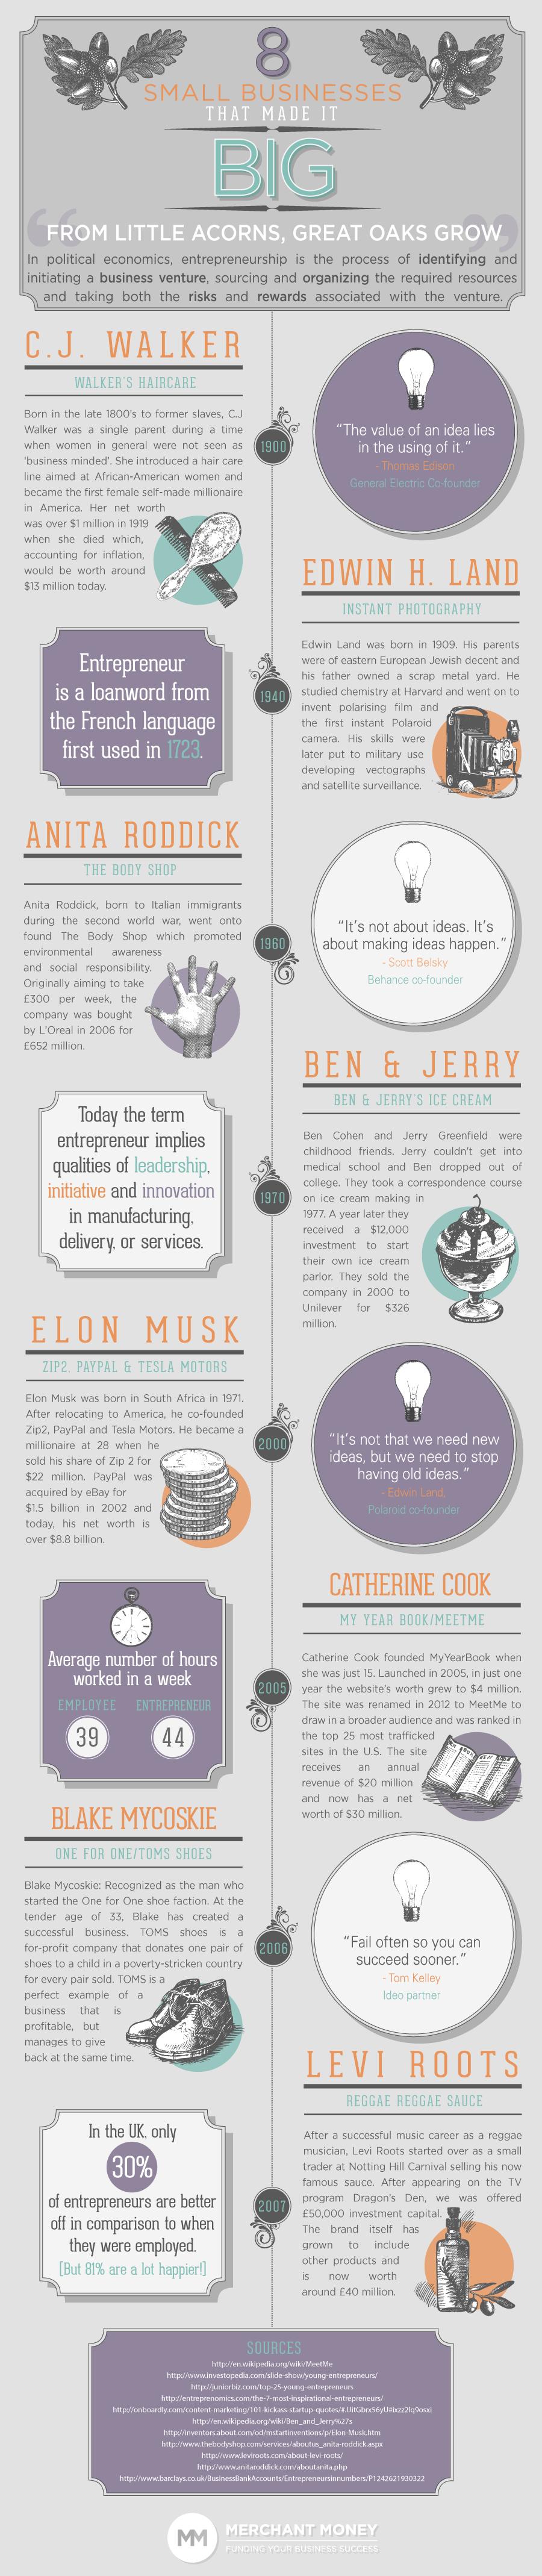 merchant-money-entrepreneurs-2-1